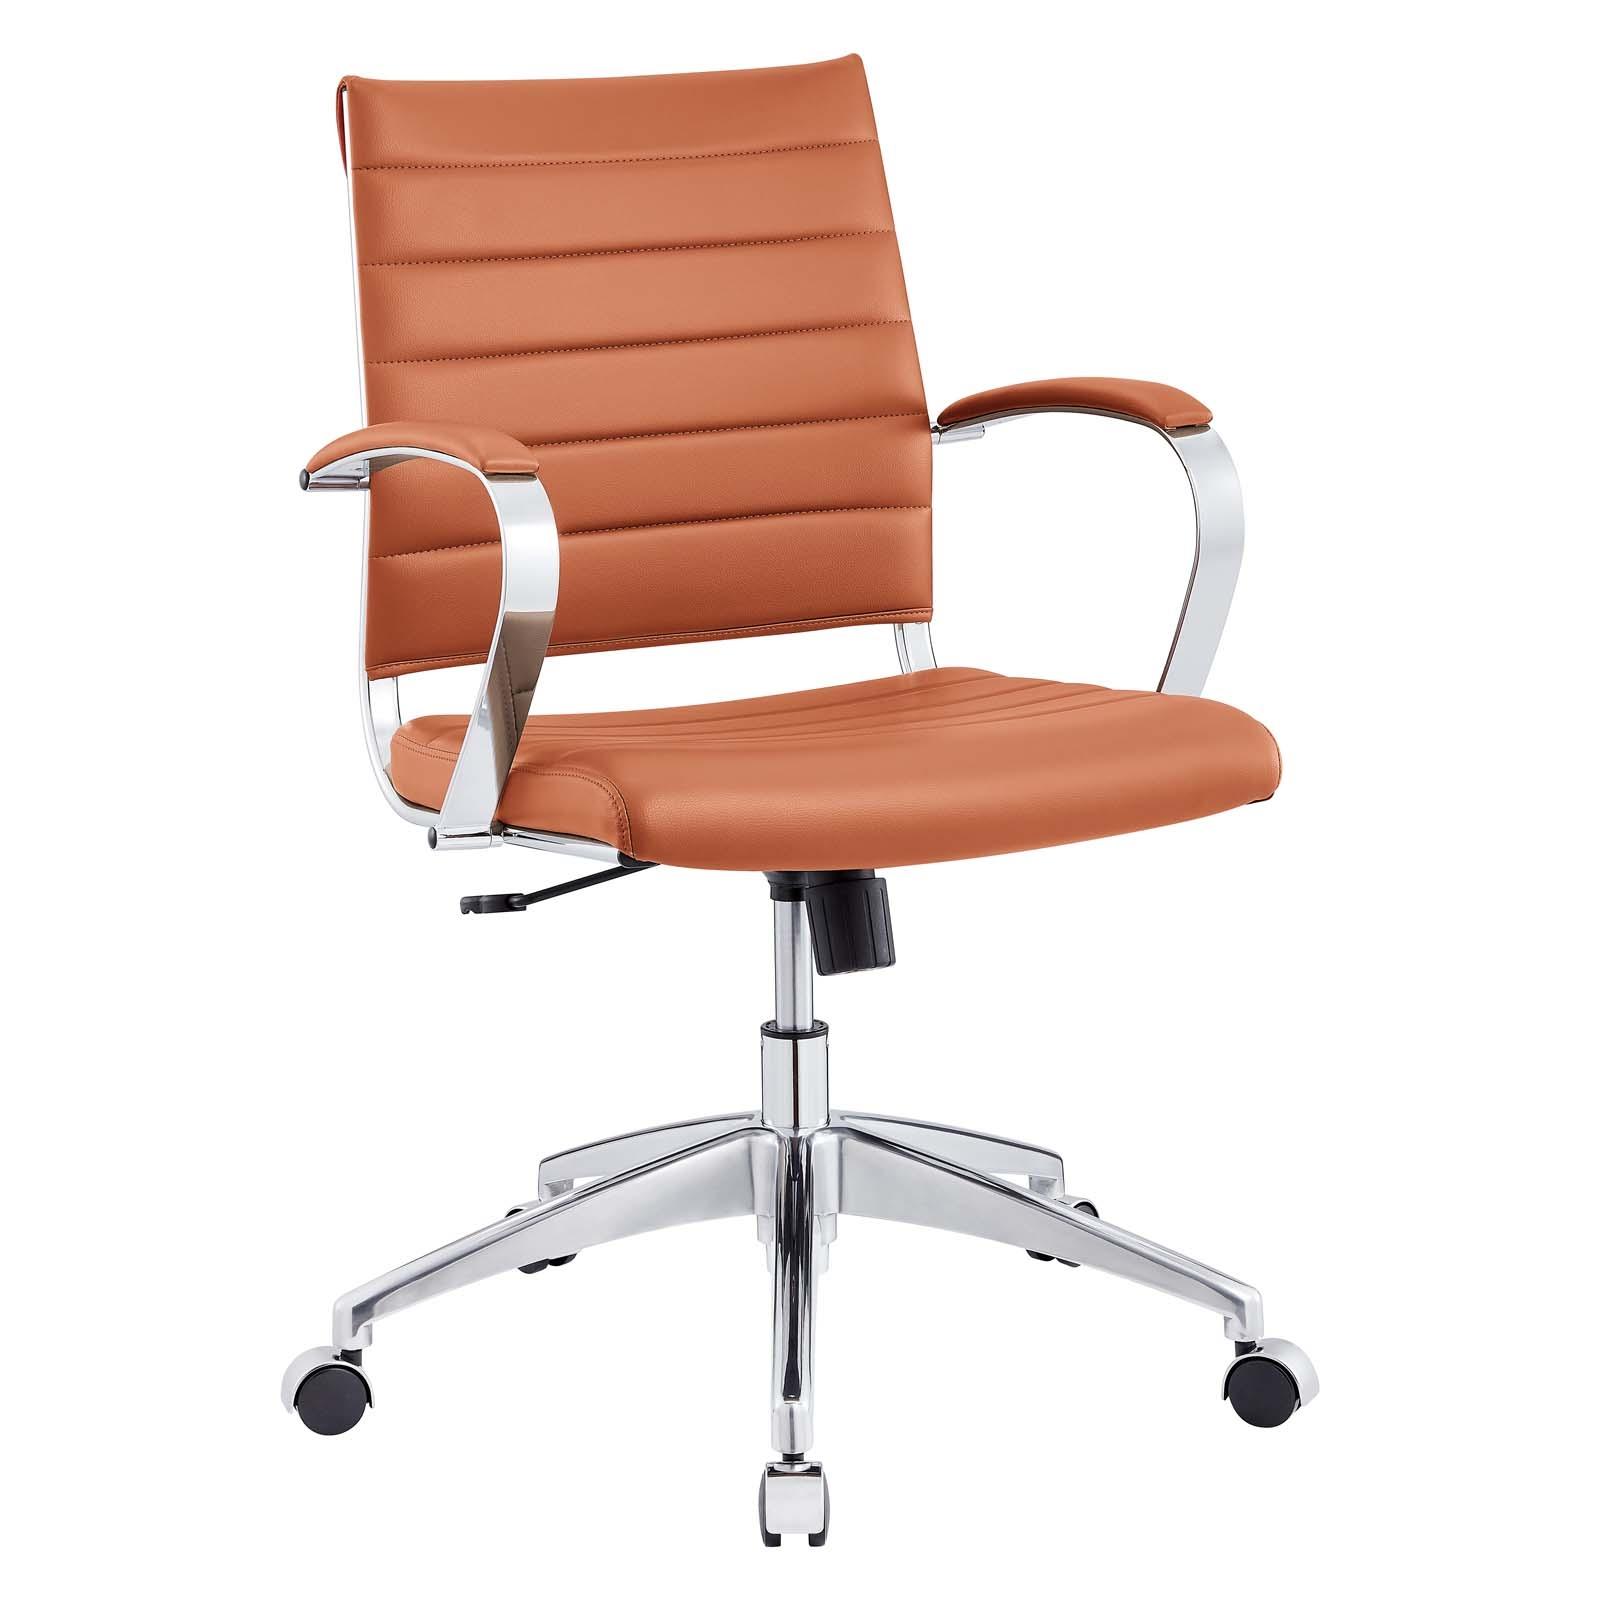 Back Office Chair in Terracotta